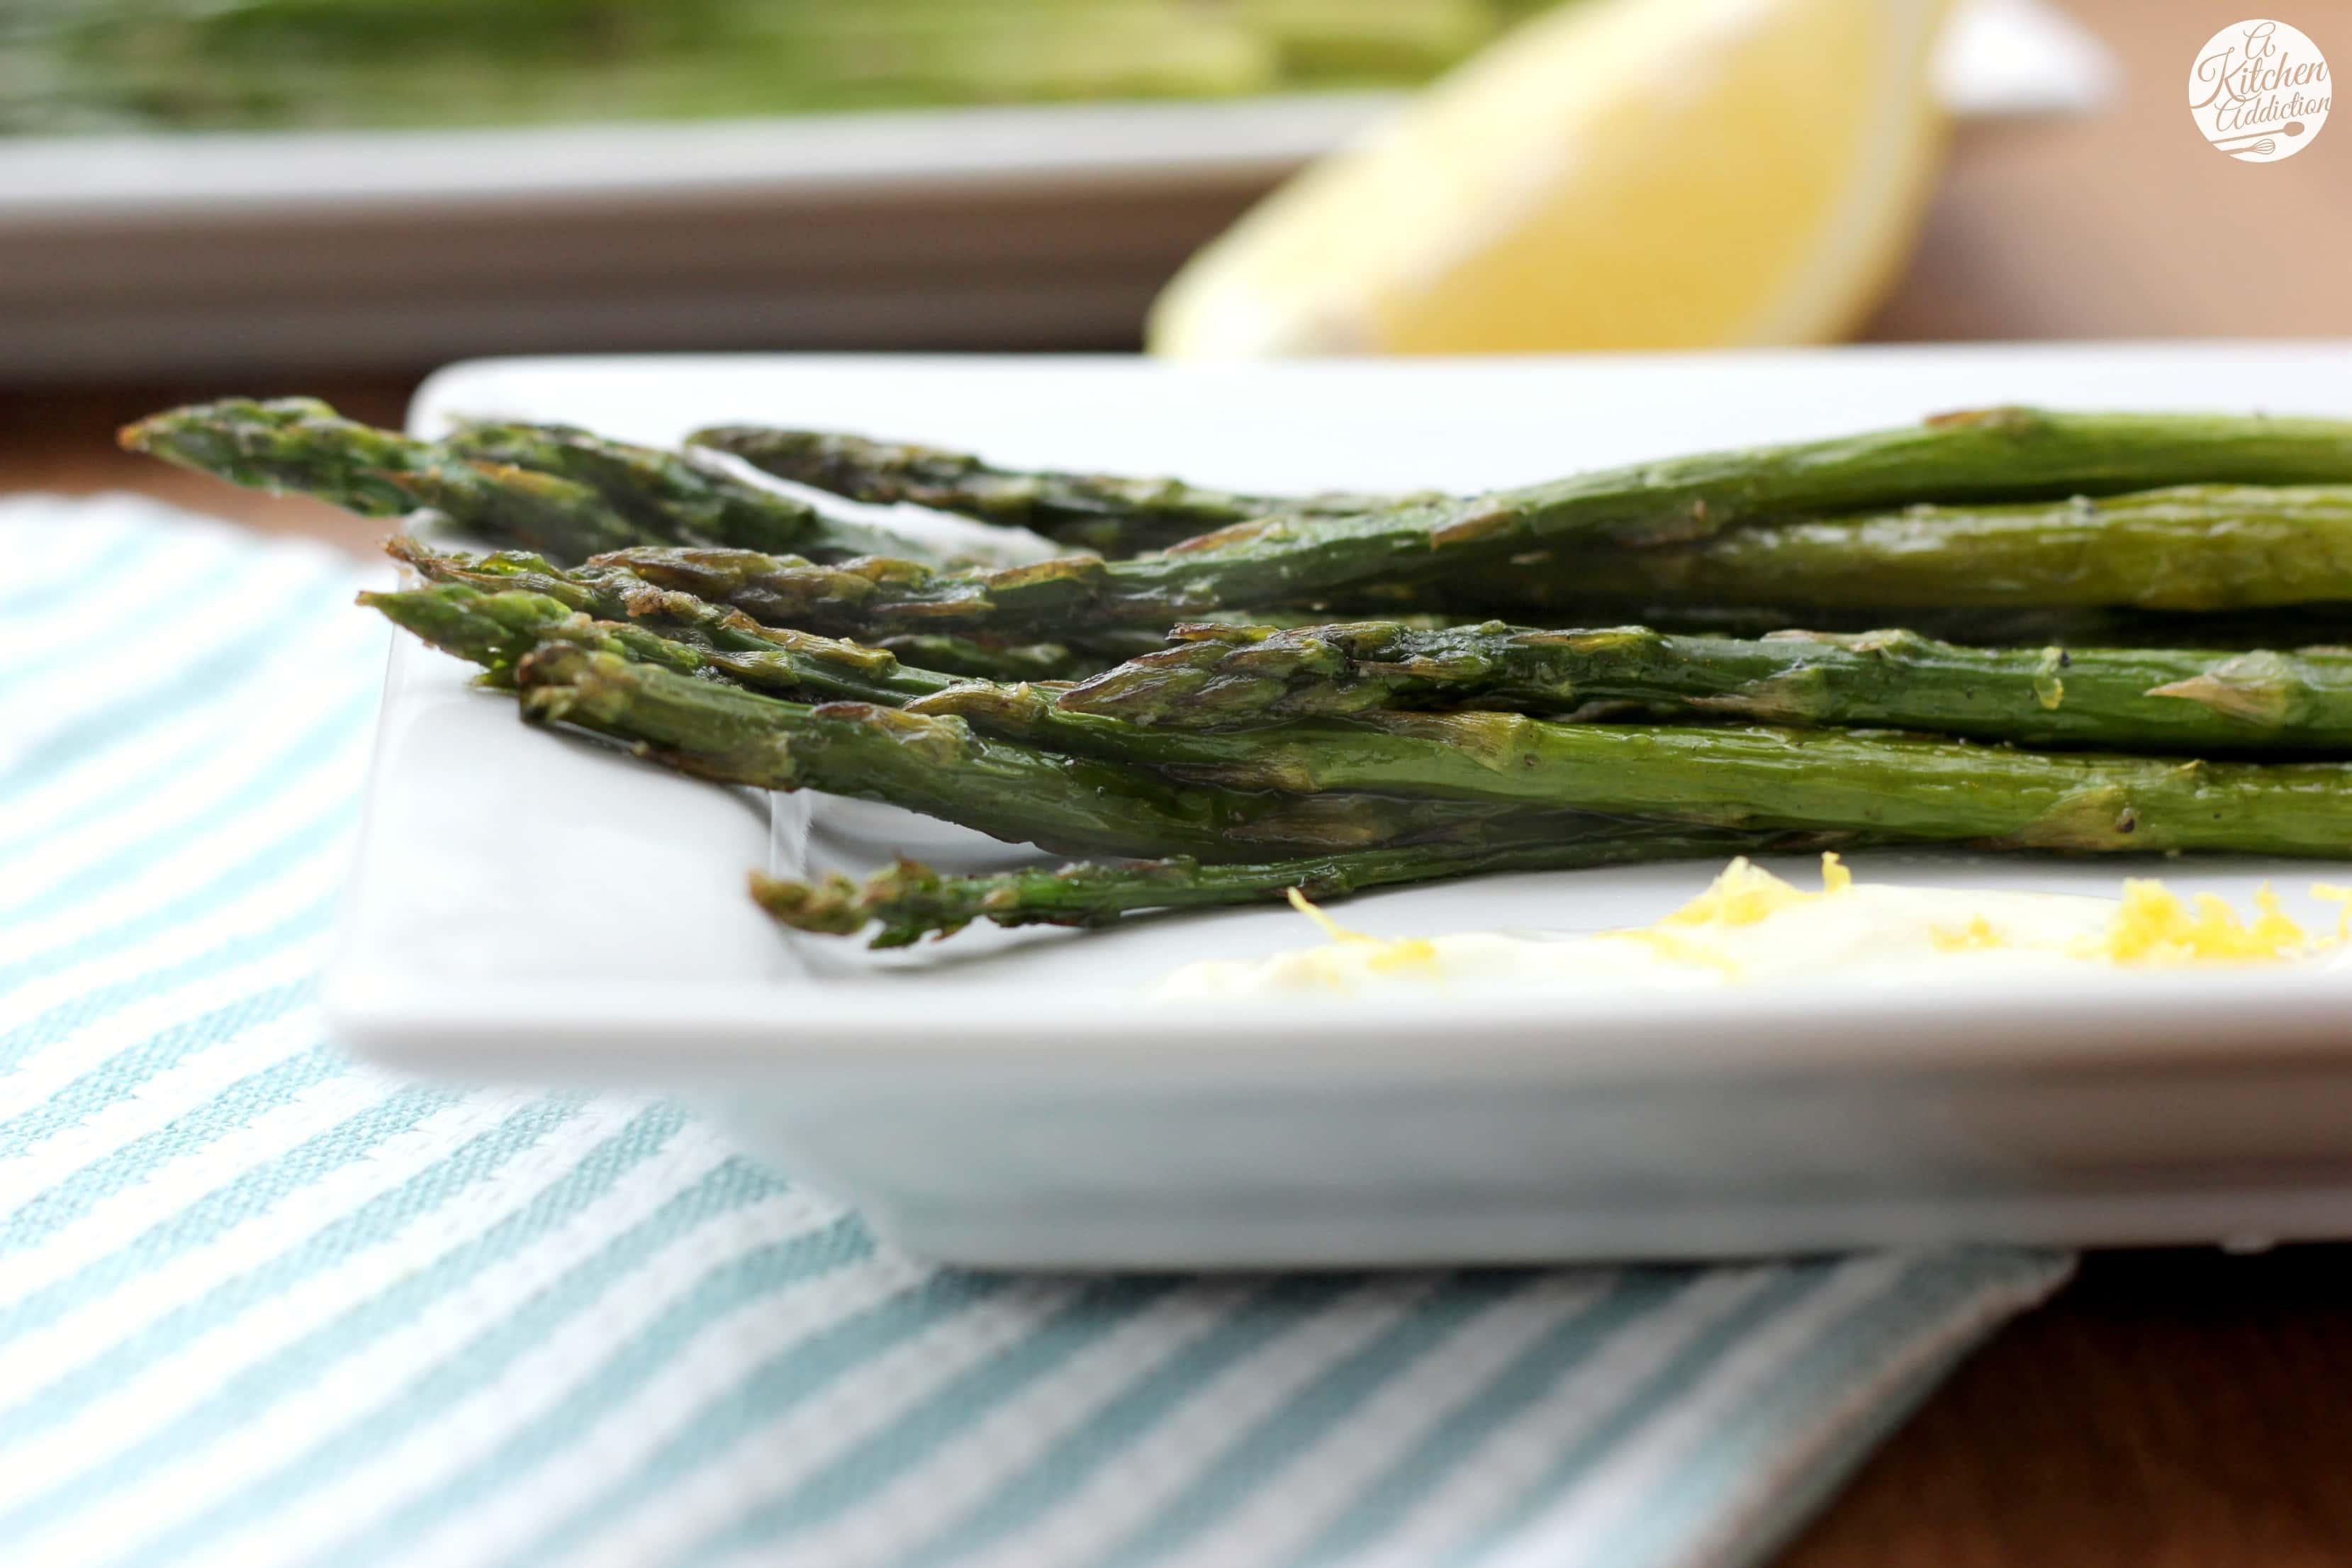 Roasted asparagus with lemon garlic yogurt sauce a kitchen addiction roasted asparagus with lemon garlic yogurt sauce recipe l a kitchen addiction ccuart Choice Image